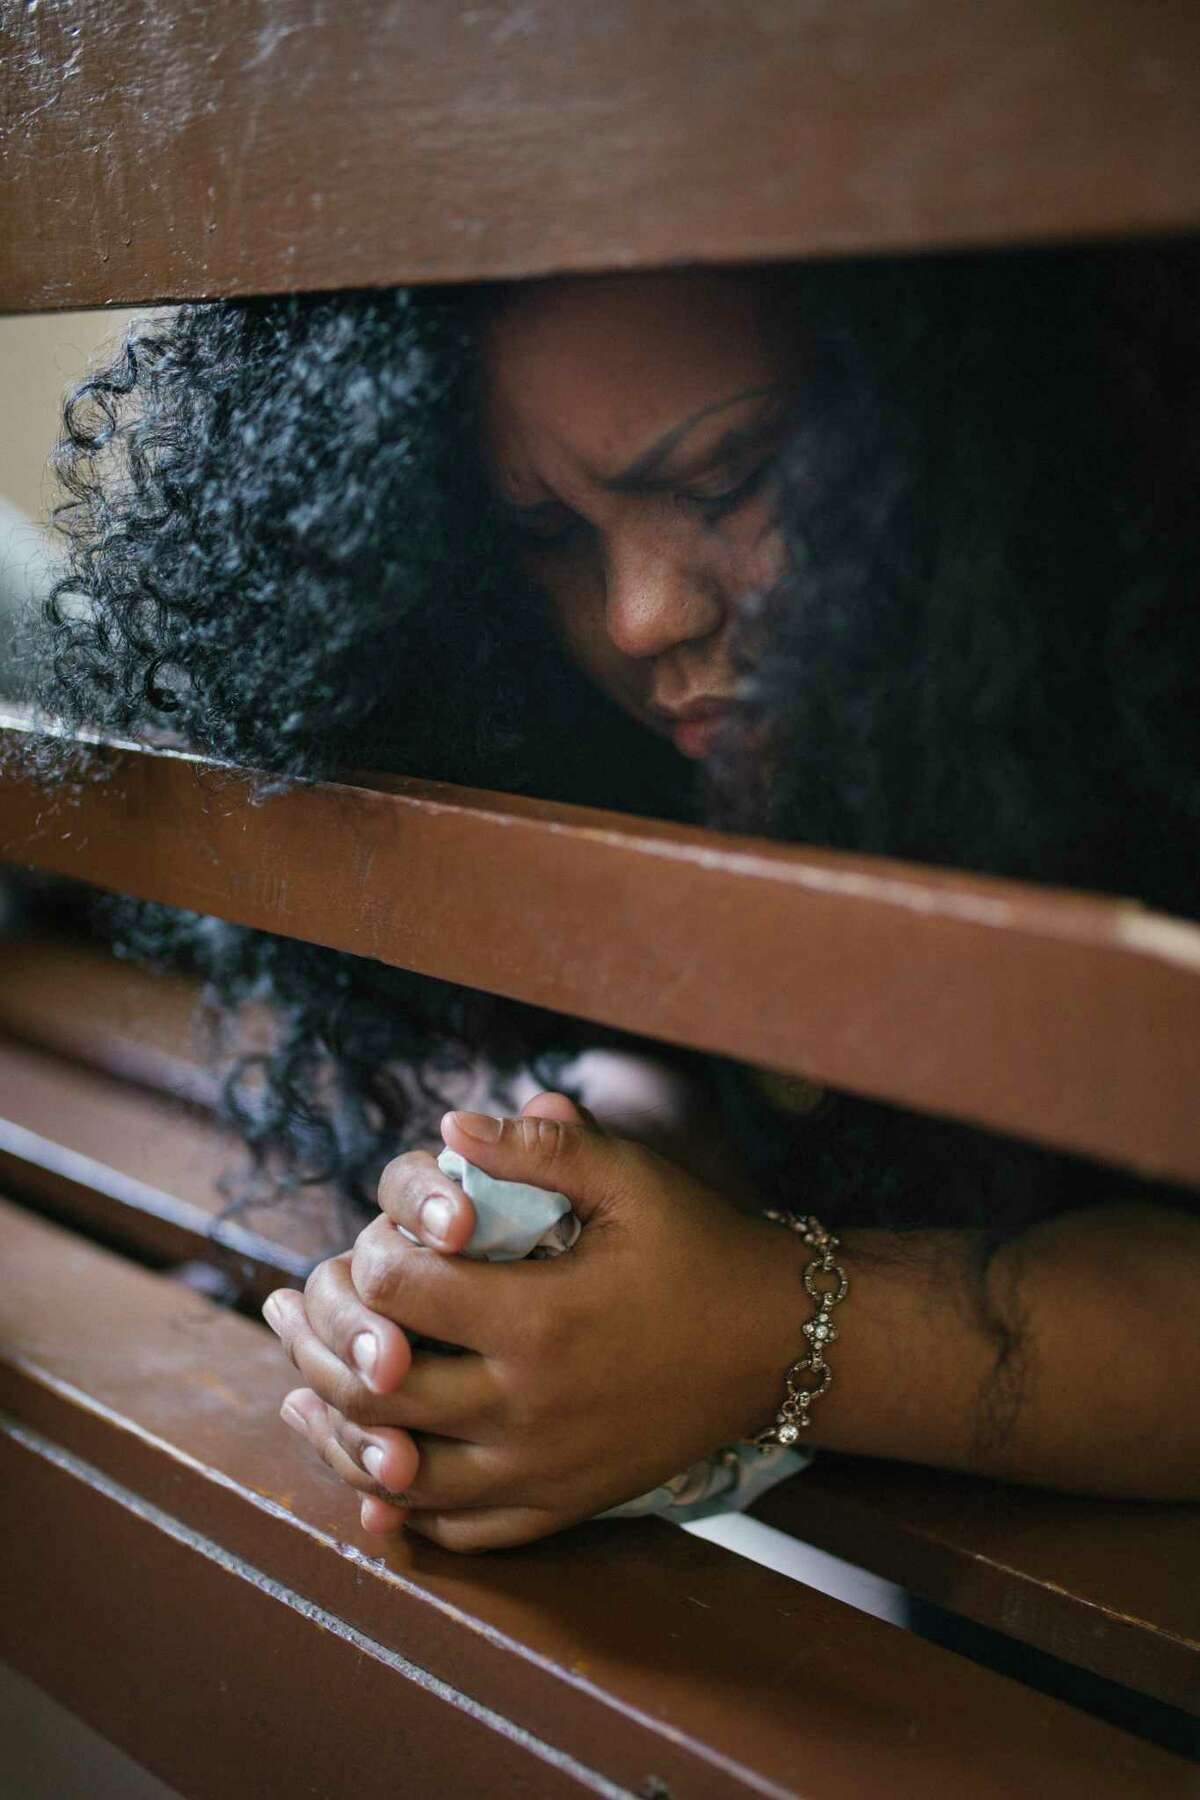 Leidy Villegas, 35, prays before the service begins.